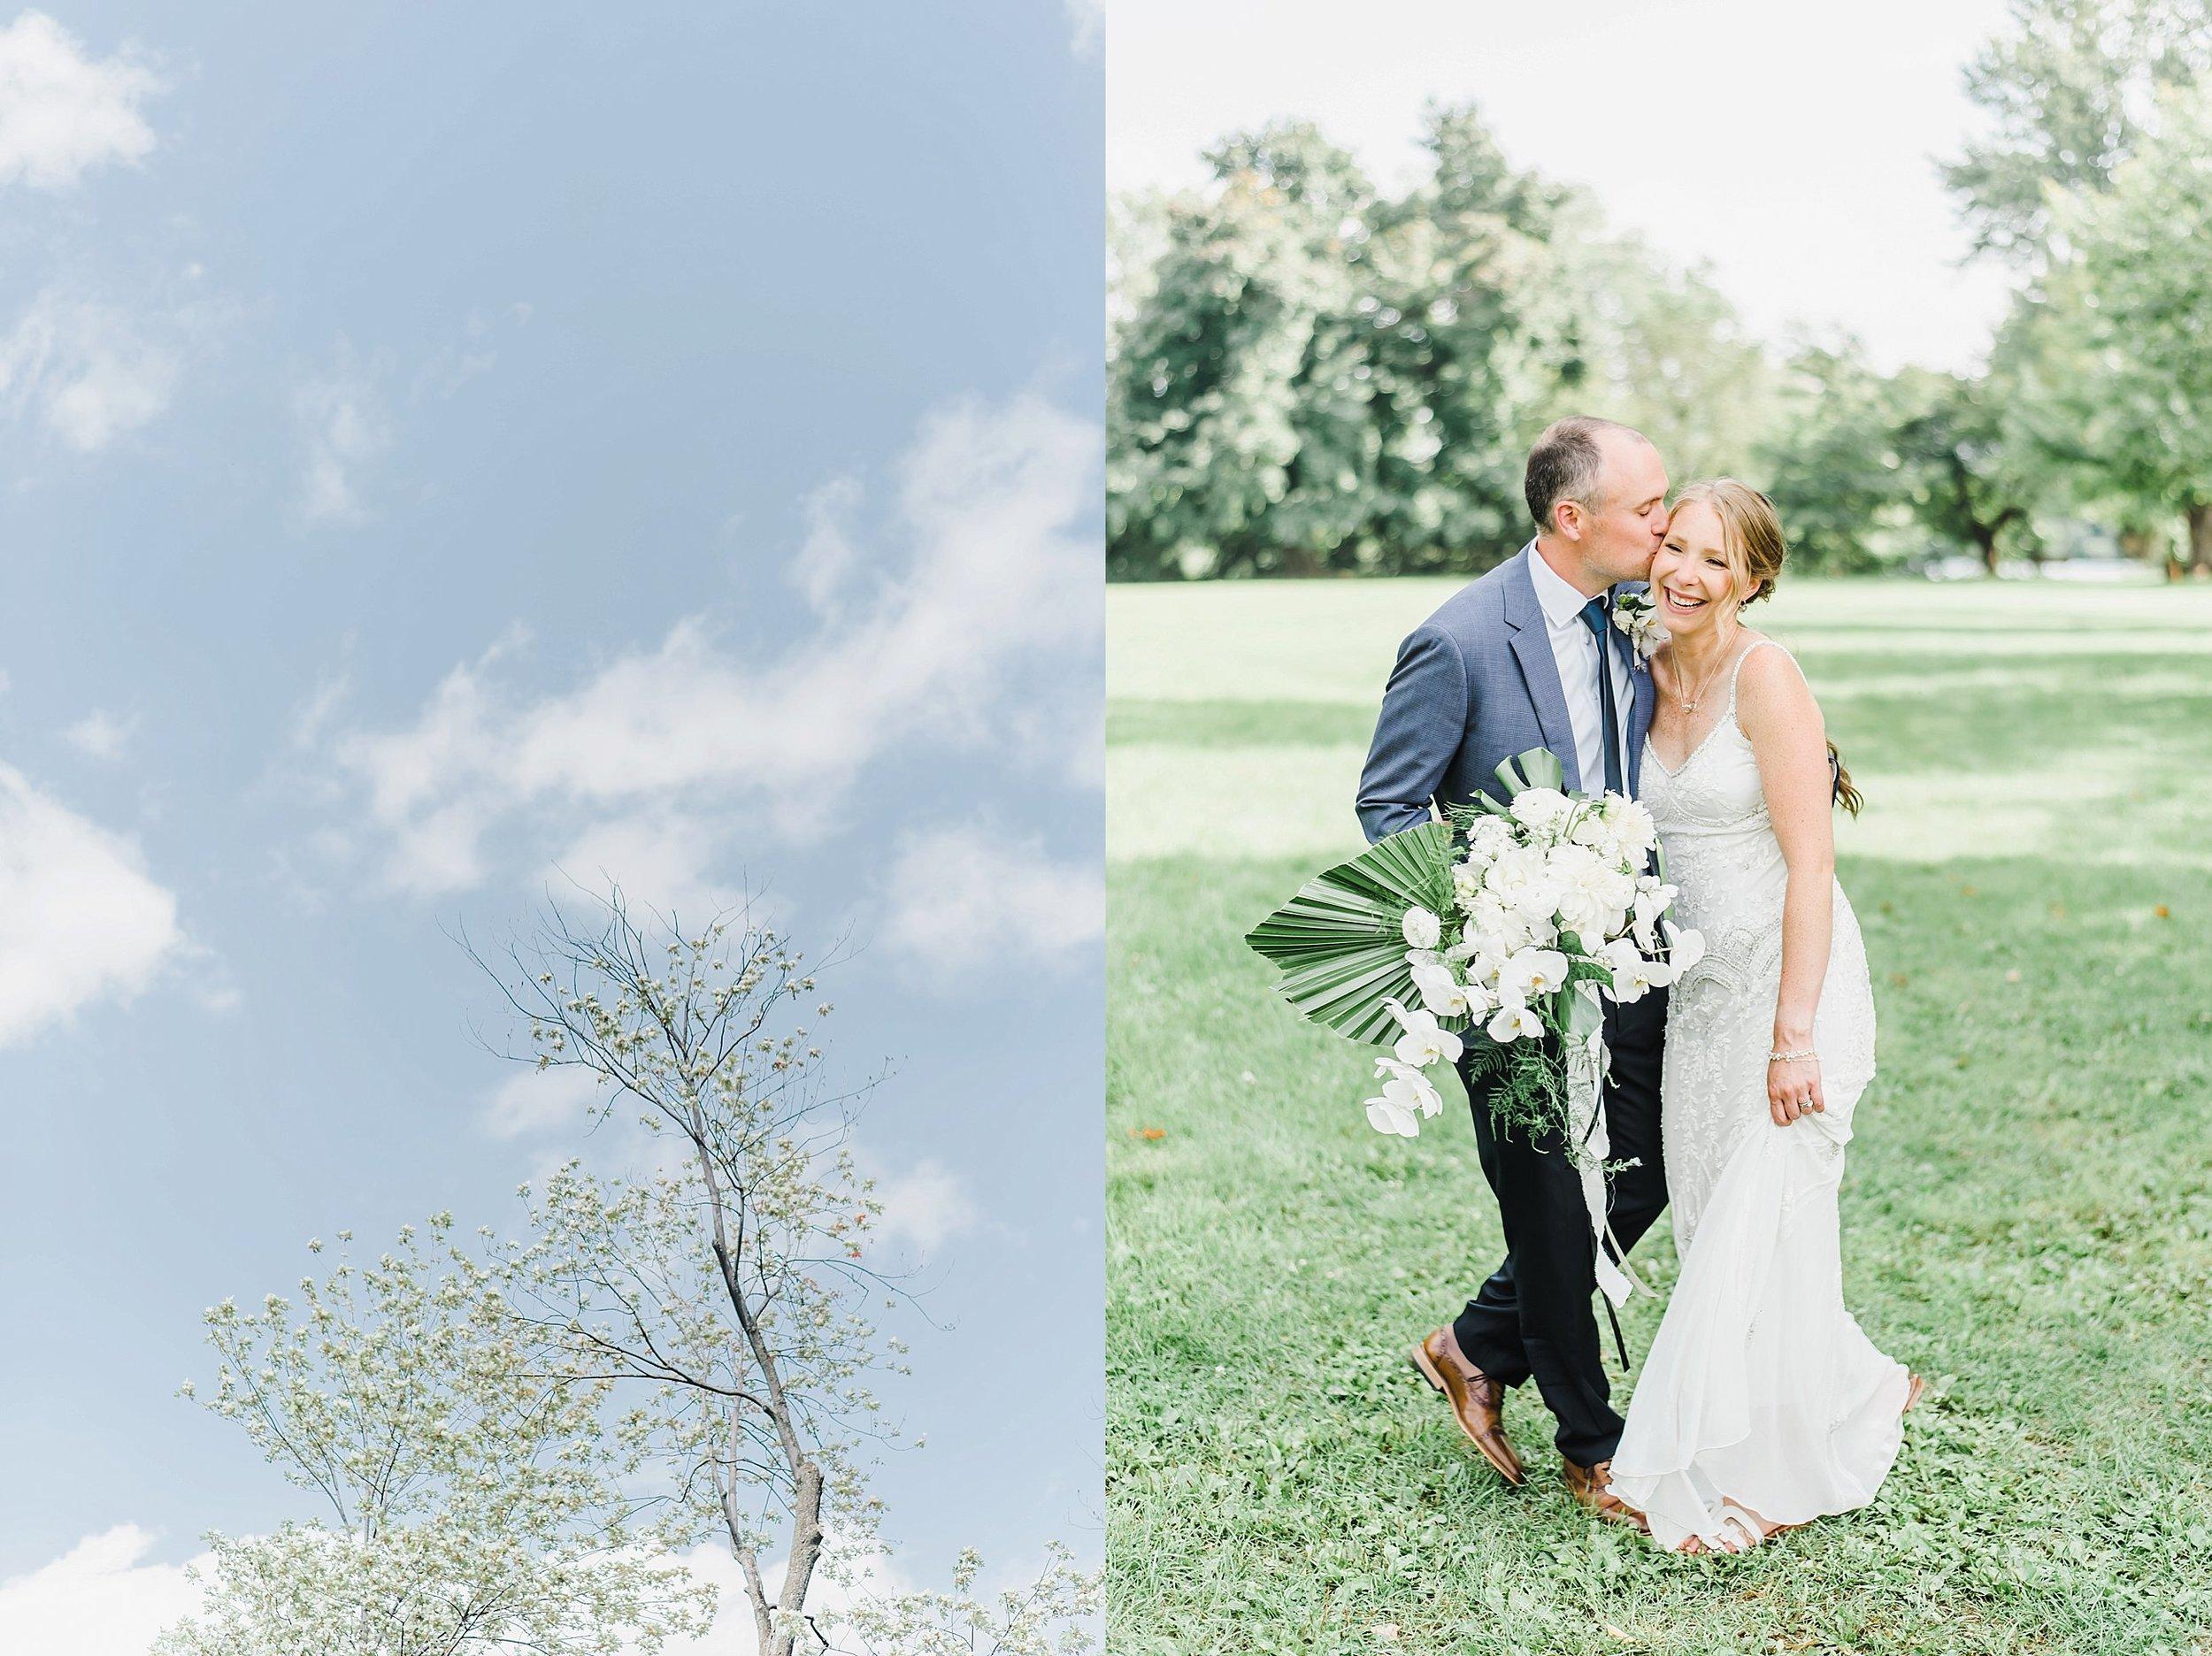 light airy indie fine art ottawa wedding photographer | Ali and Batoul Photography_0662.jpg